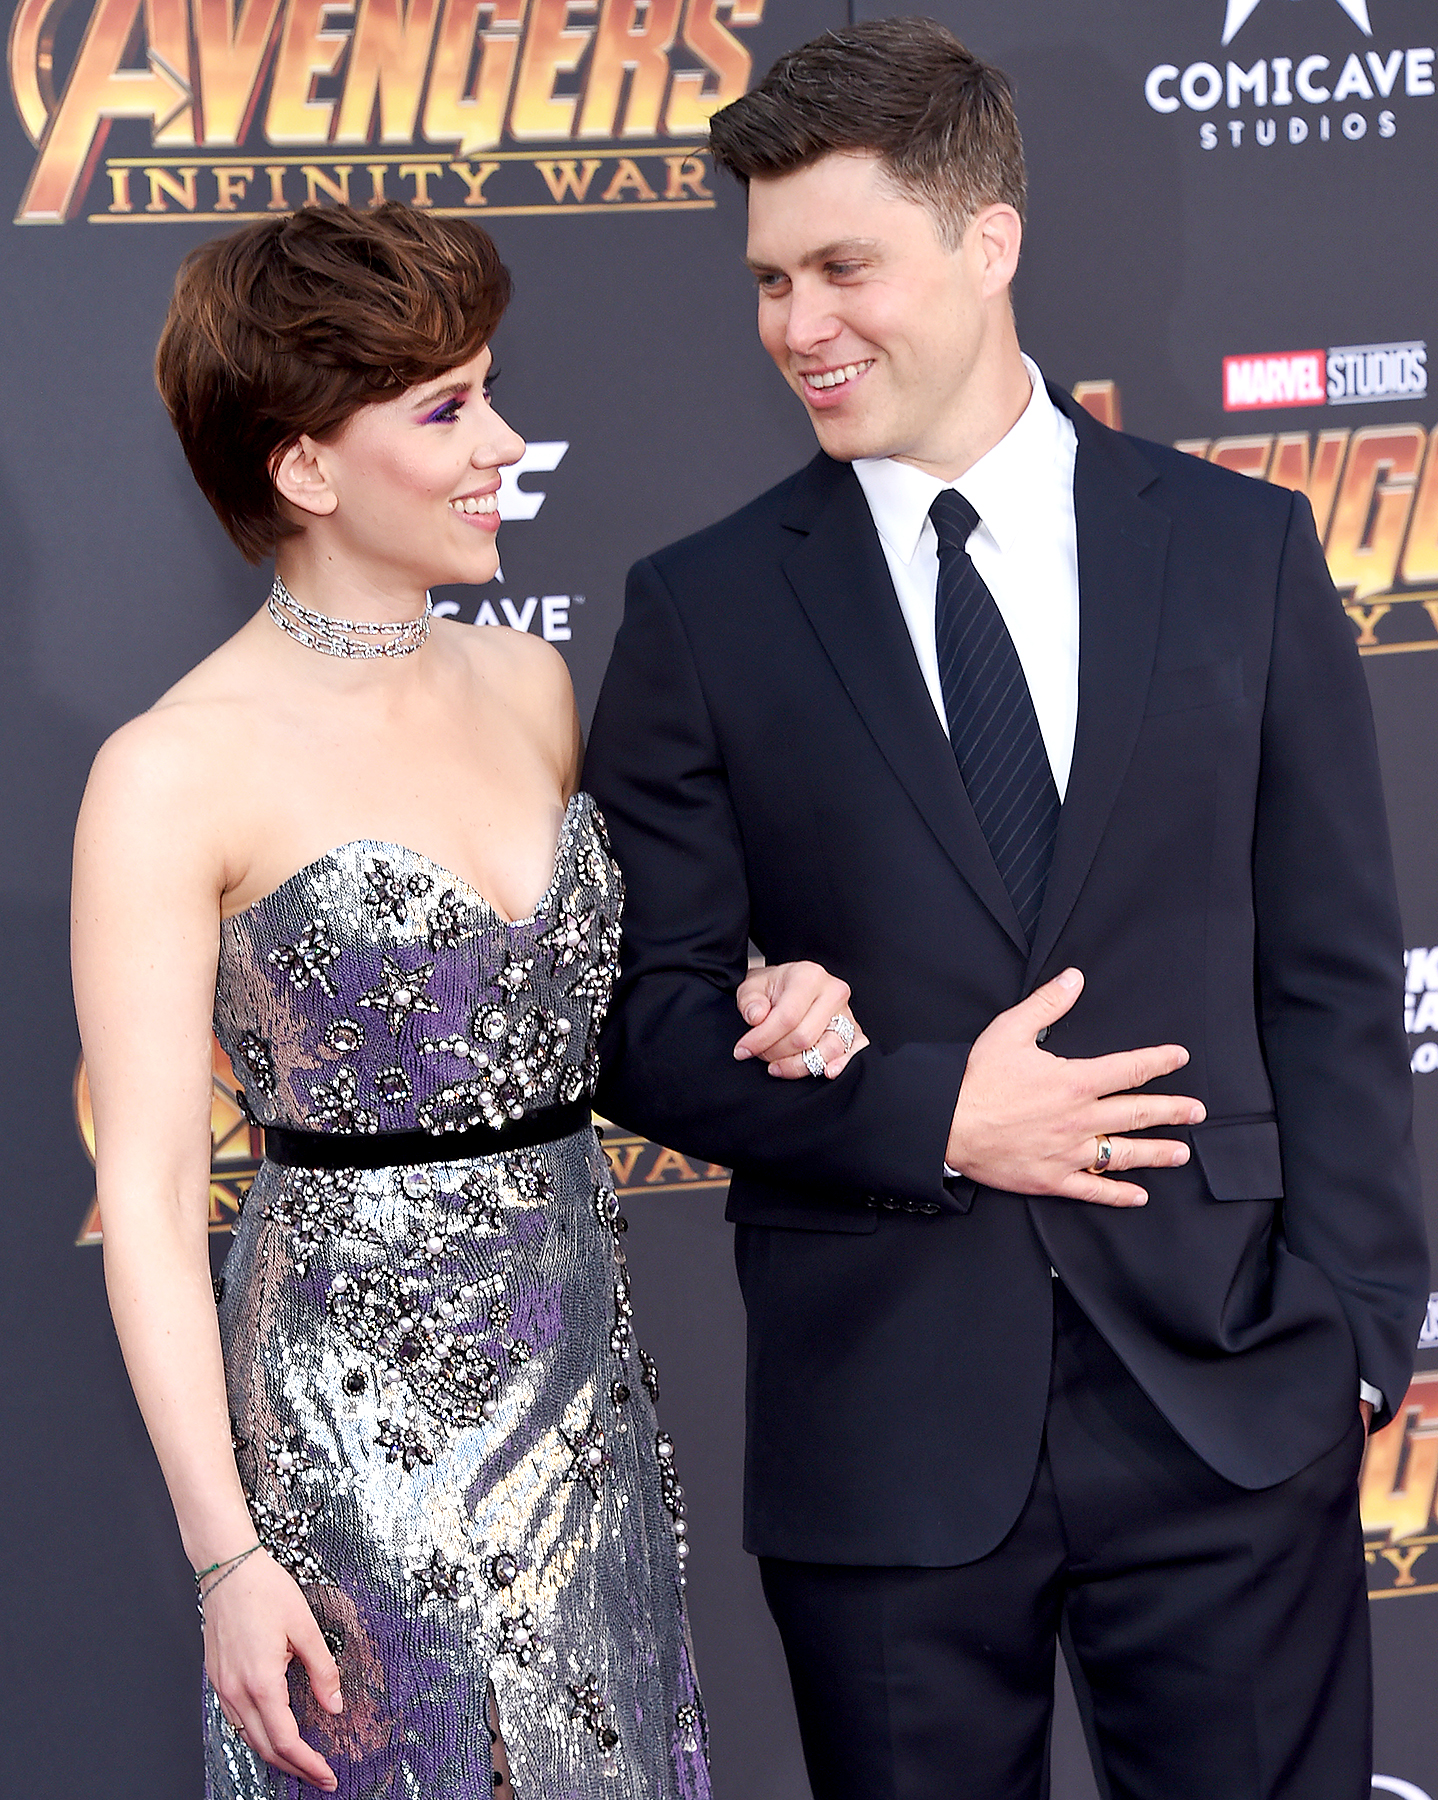 Scarlett Johansson, Colin Jost Get Pranked by Michael Che